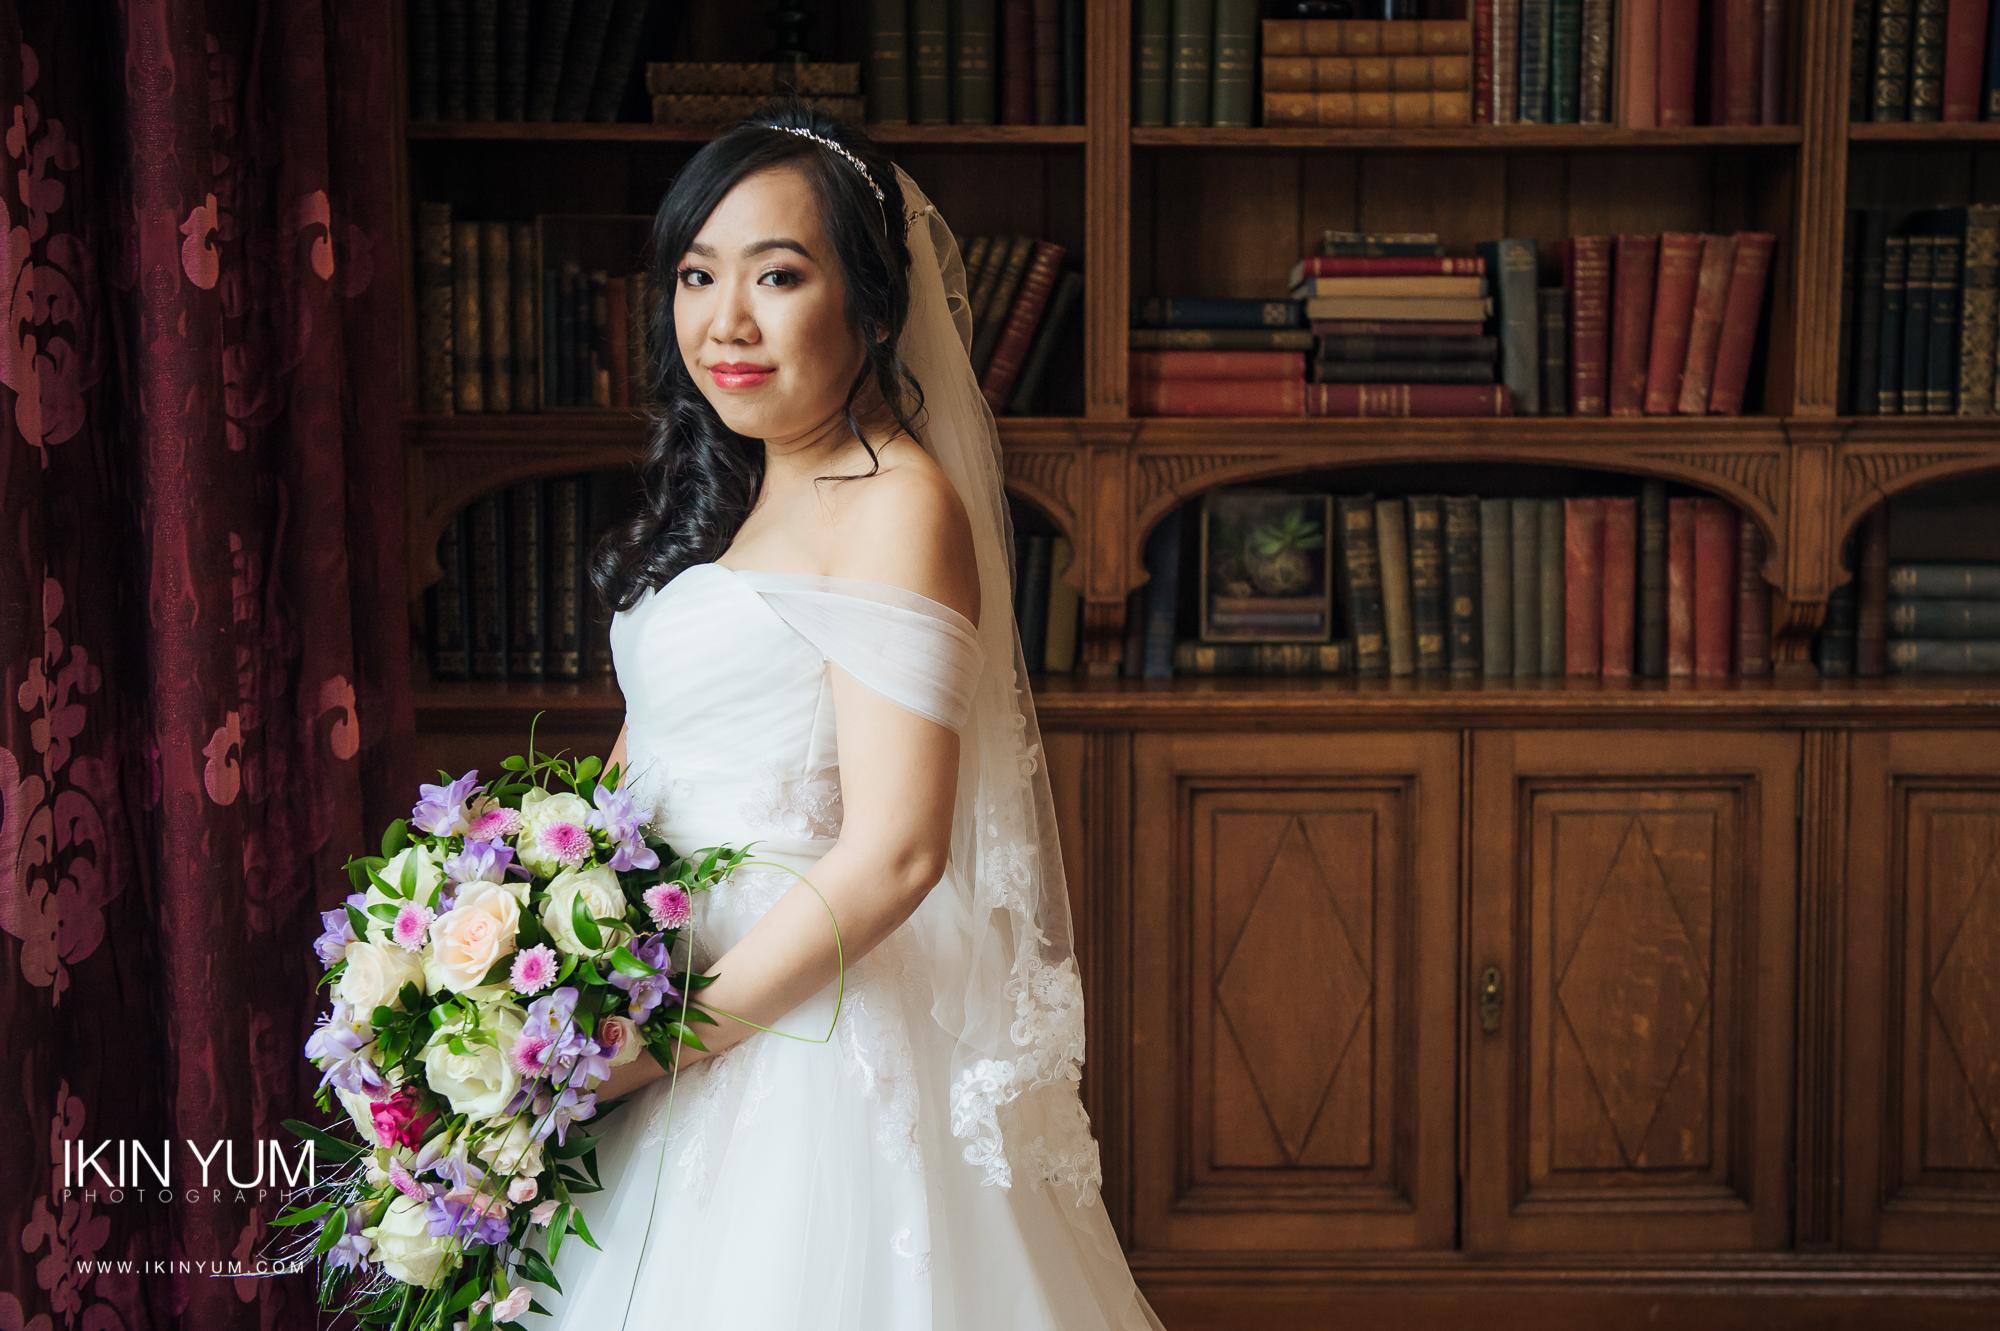 Hampton Manor Wedding - Ikin Yum Photography -060.jpg